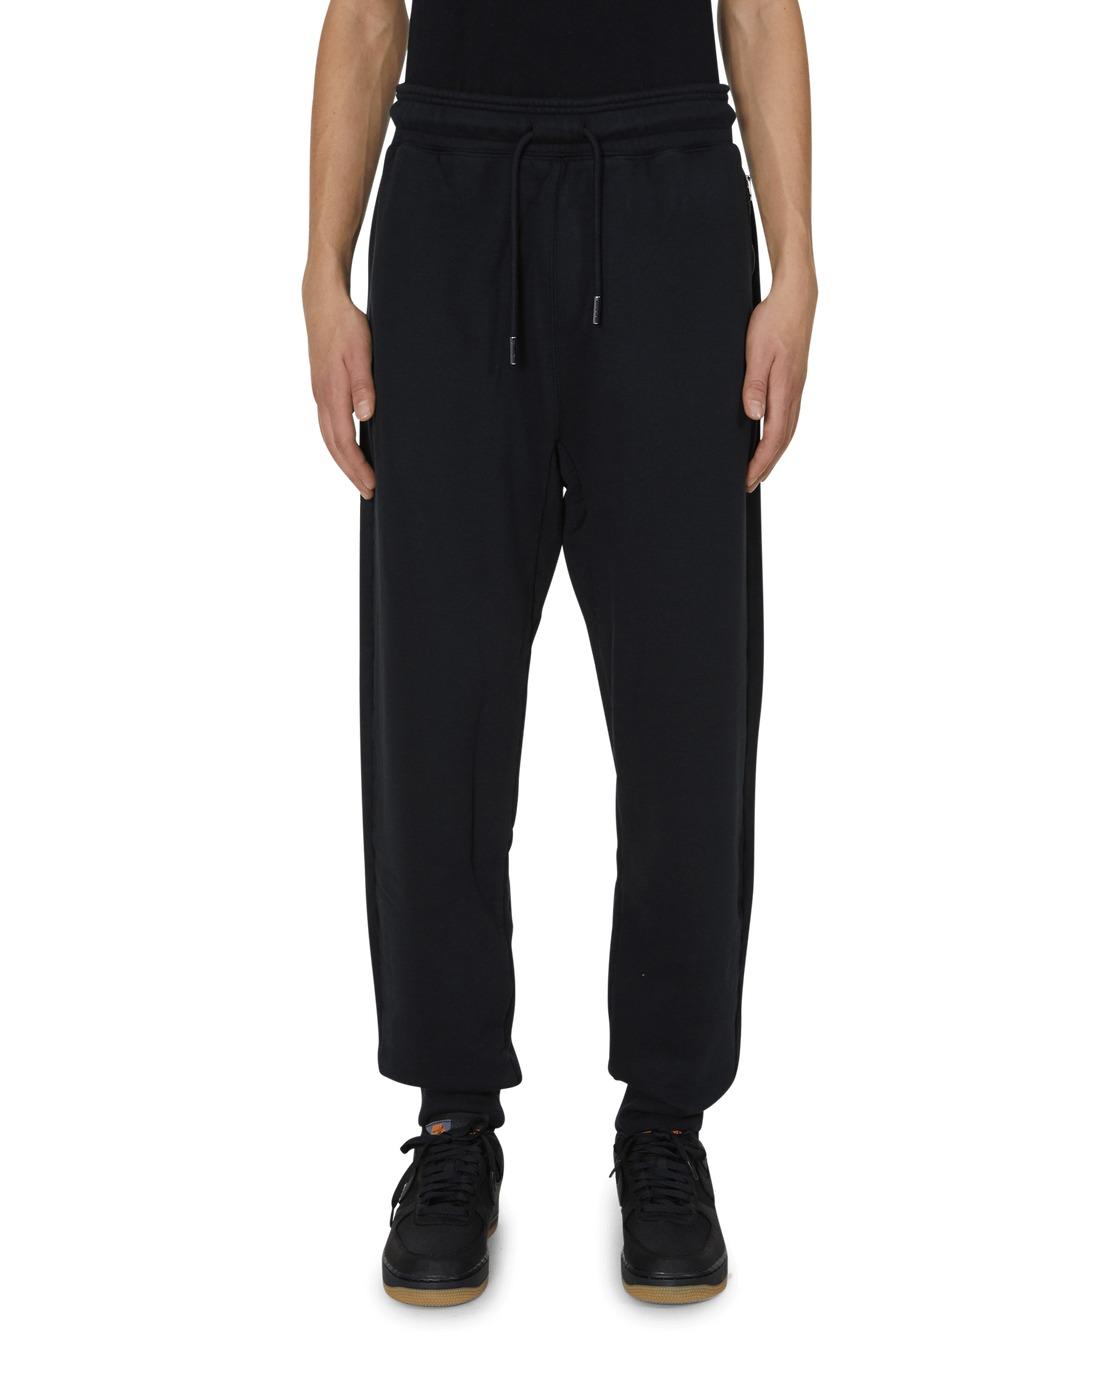 Photo: Nike Jordan Black Cat Fleece Pants Black